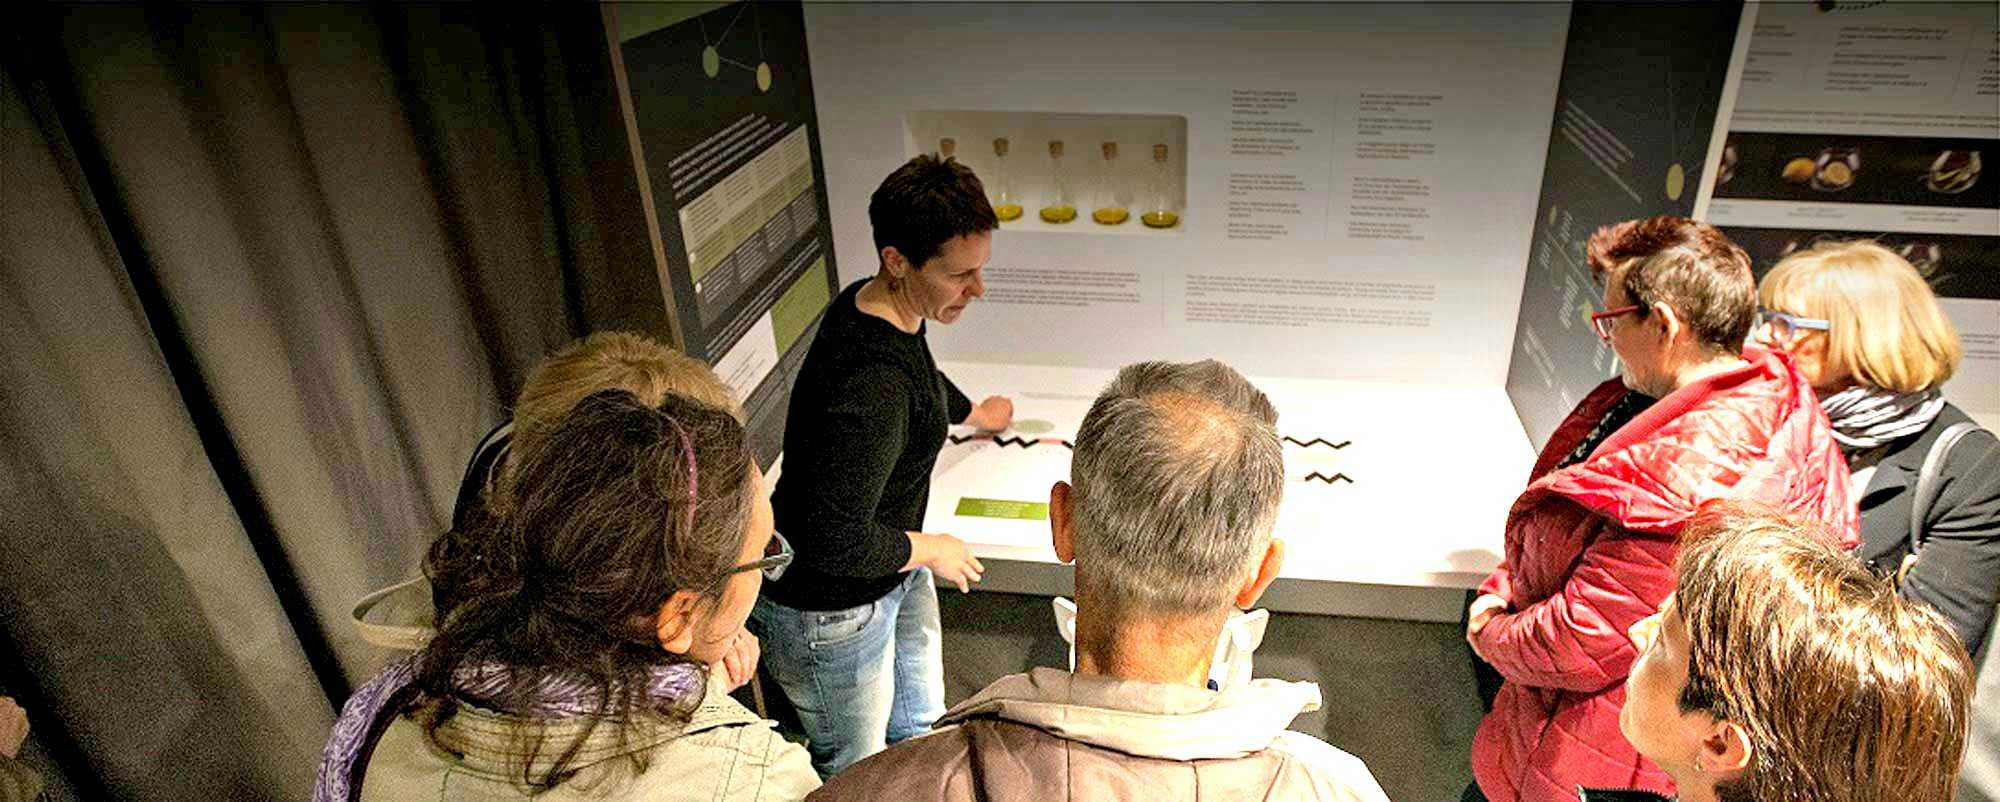 museum-of-istrian-olive-oil-opens-in-pula-croatia